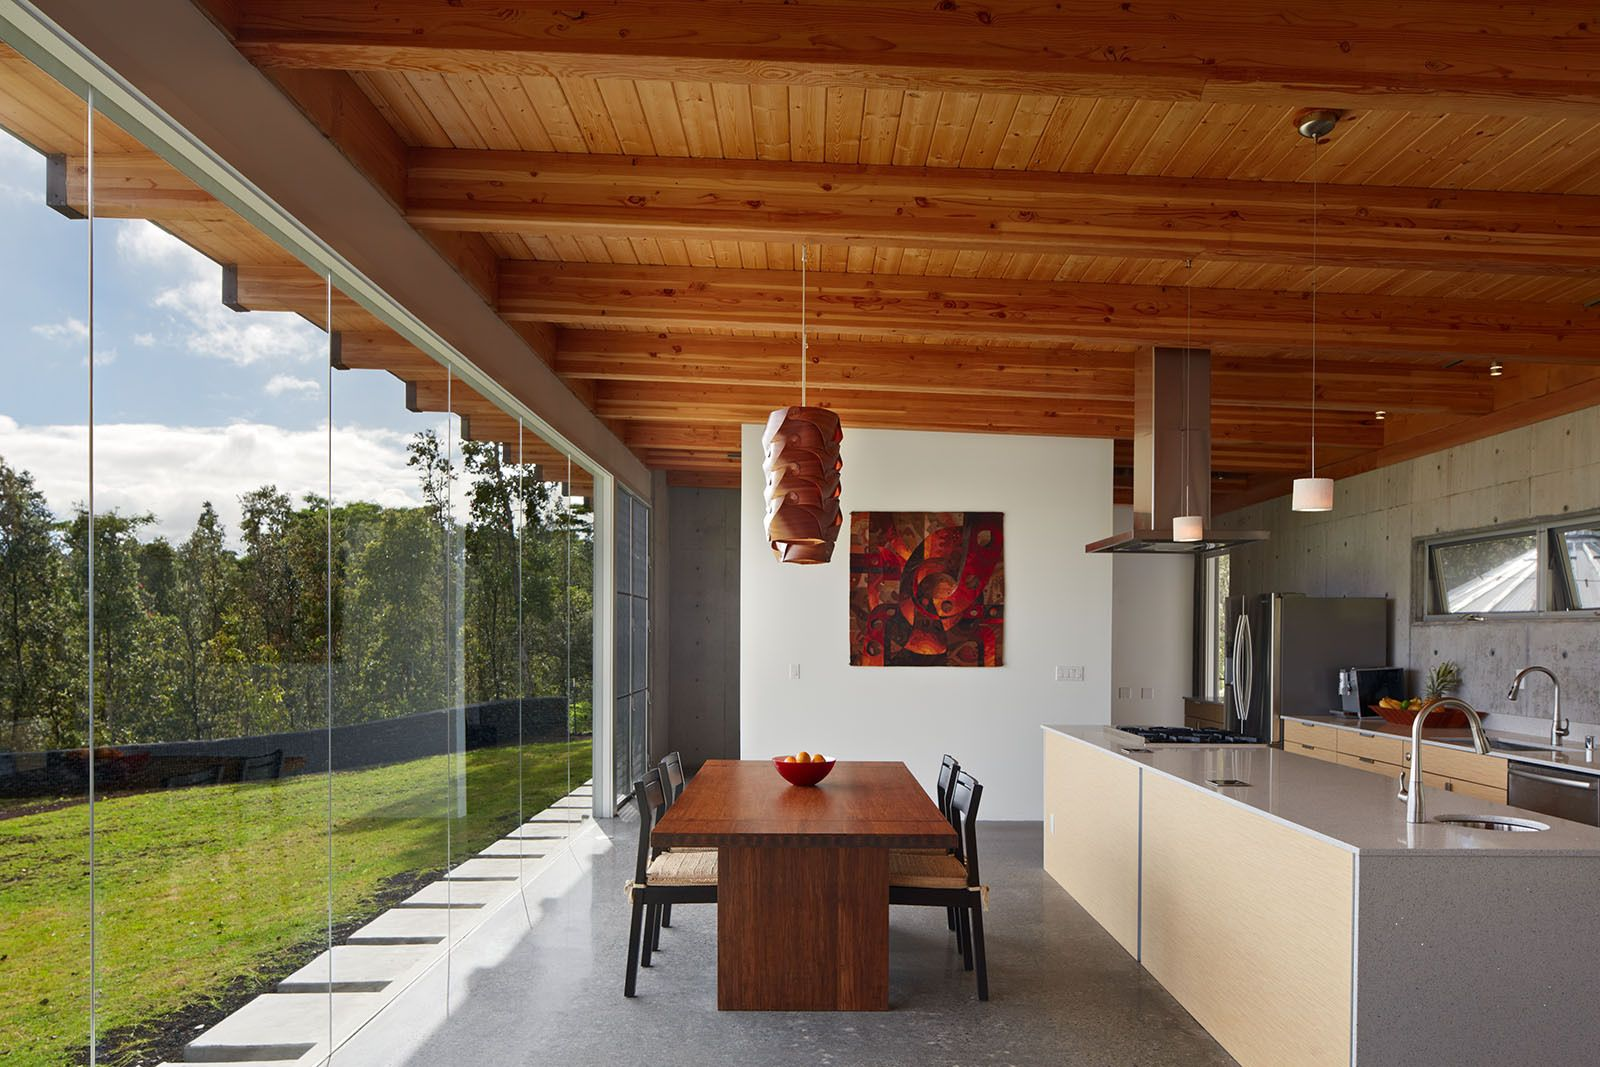 Galería - Lavaflow 7 / Craig Steely Architecture - 81